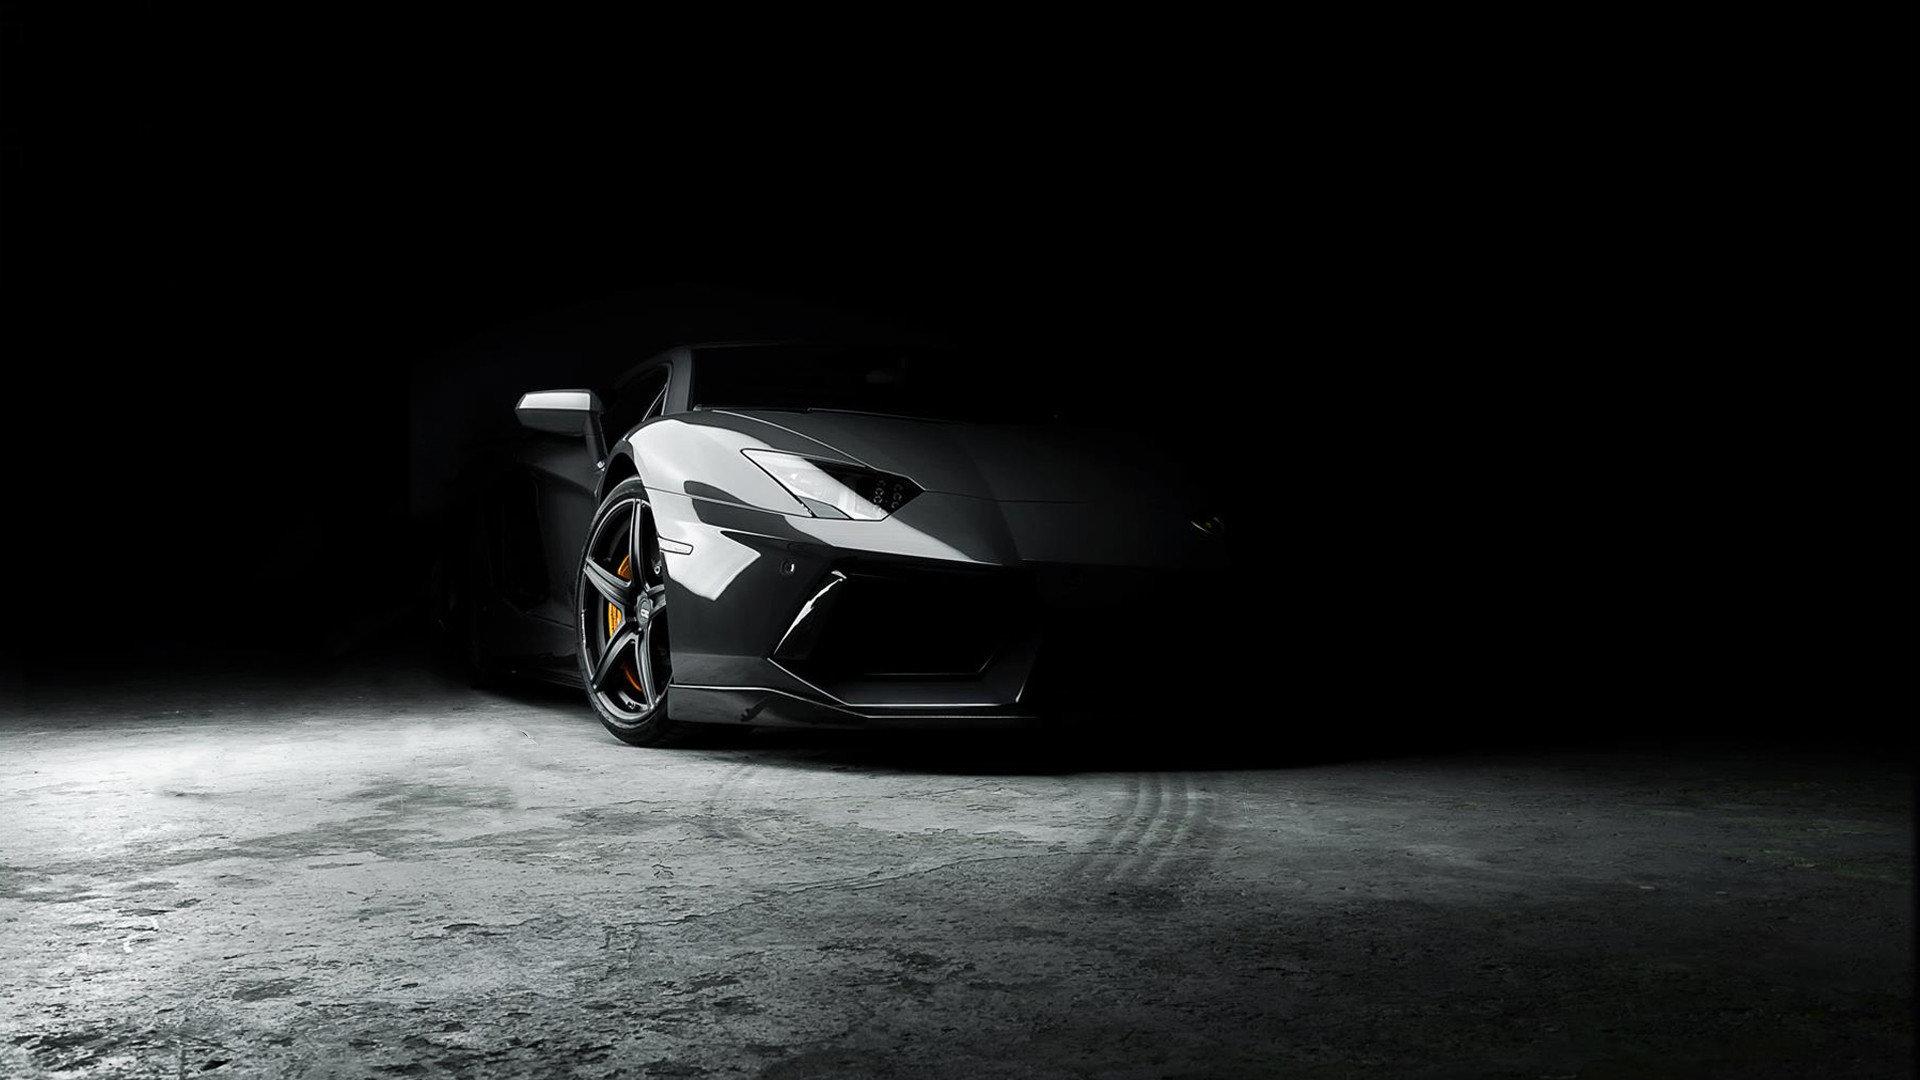 Free Lamborghini Aventador High Quality Wallpaper Id 324142 For Full